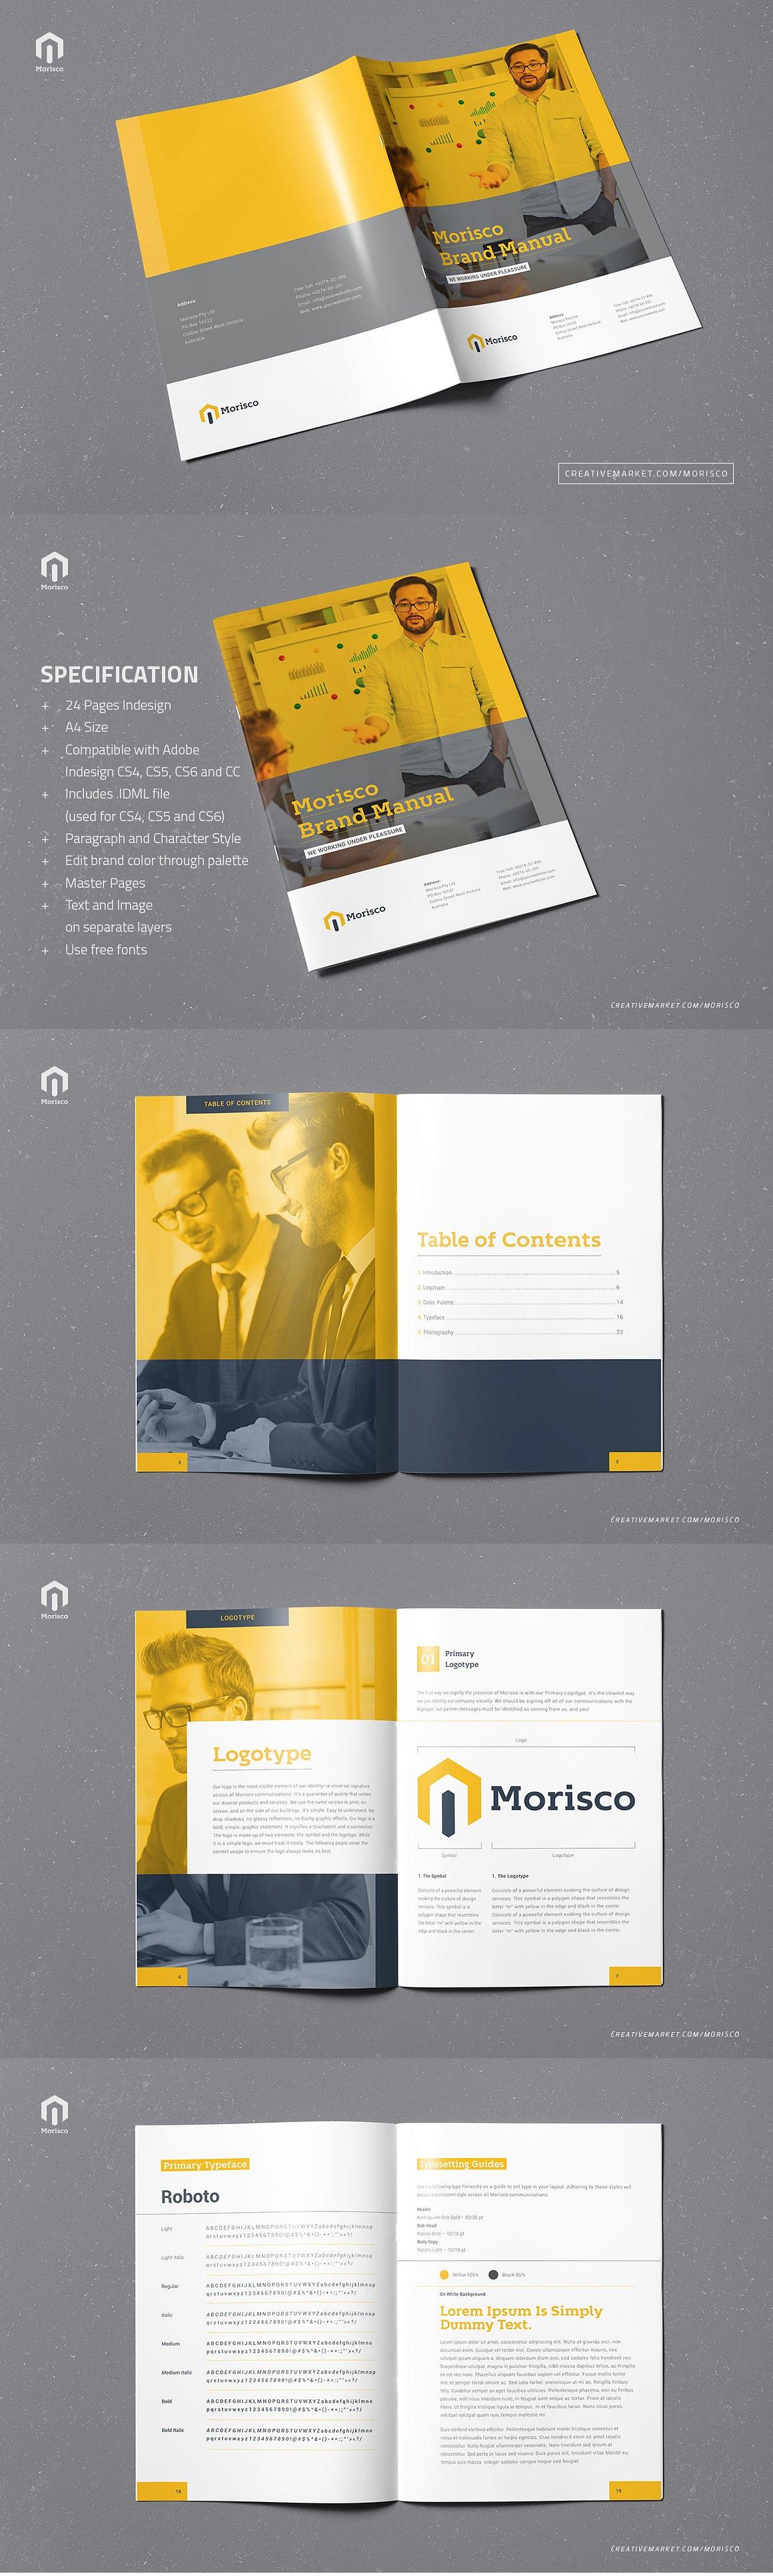 Brand Manual | Adobe indesign, Adobe y Filo